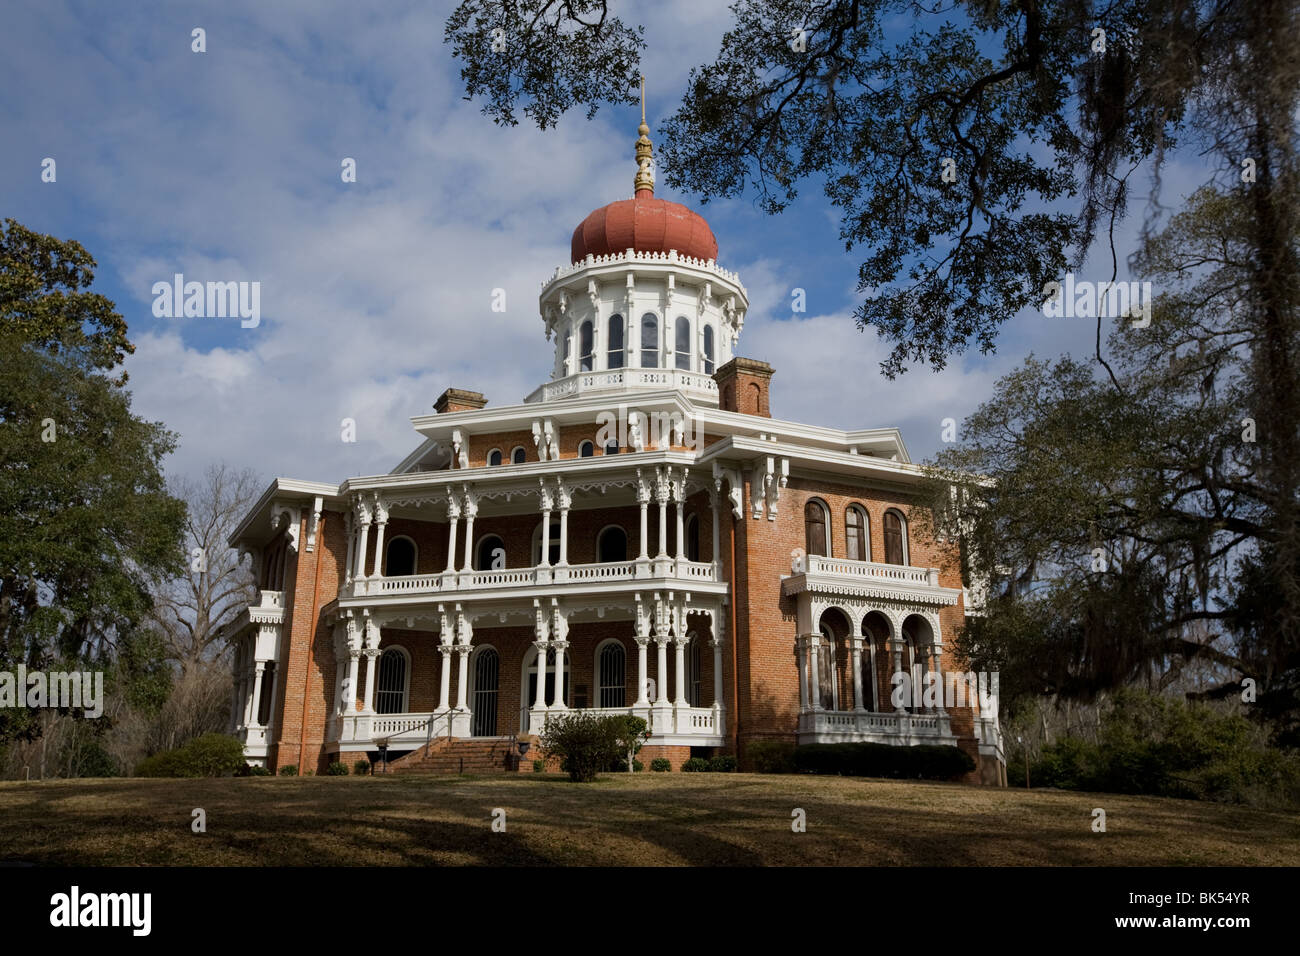 Longwood Mansion, largest octagonal in USA, antebellum plantation home, Natchez, Mississippi - Stock Image